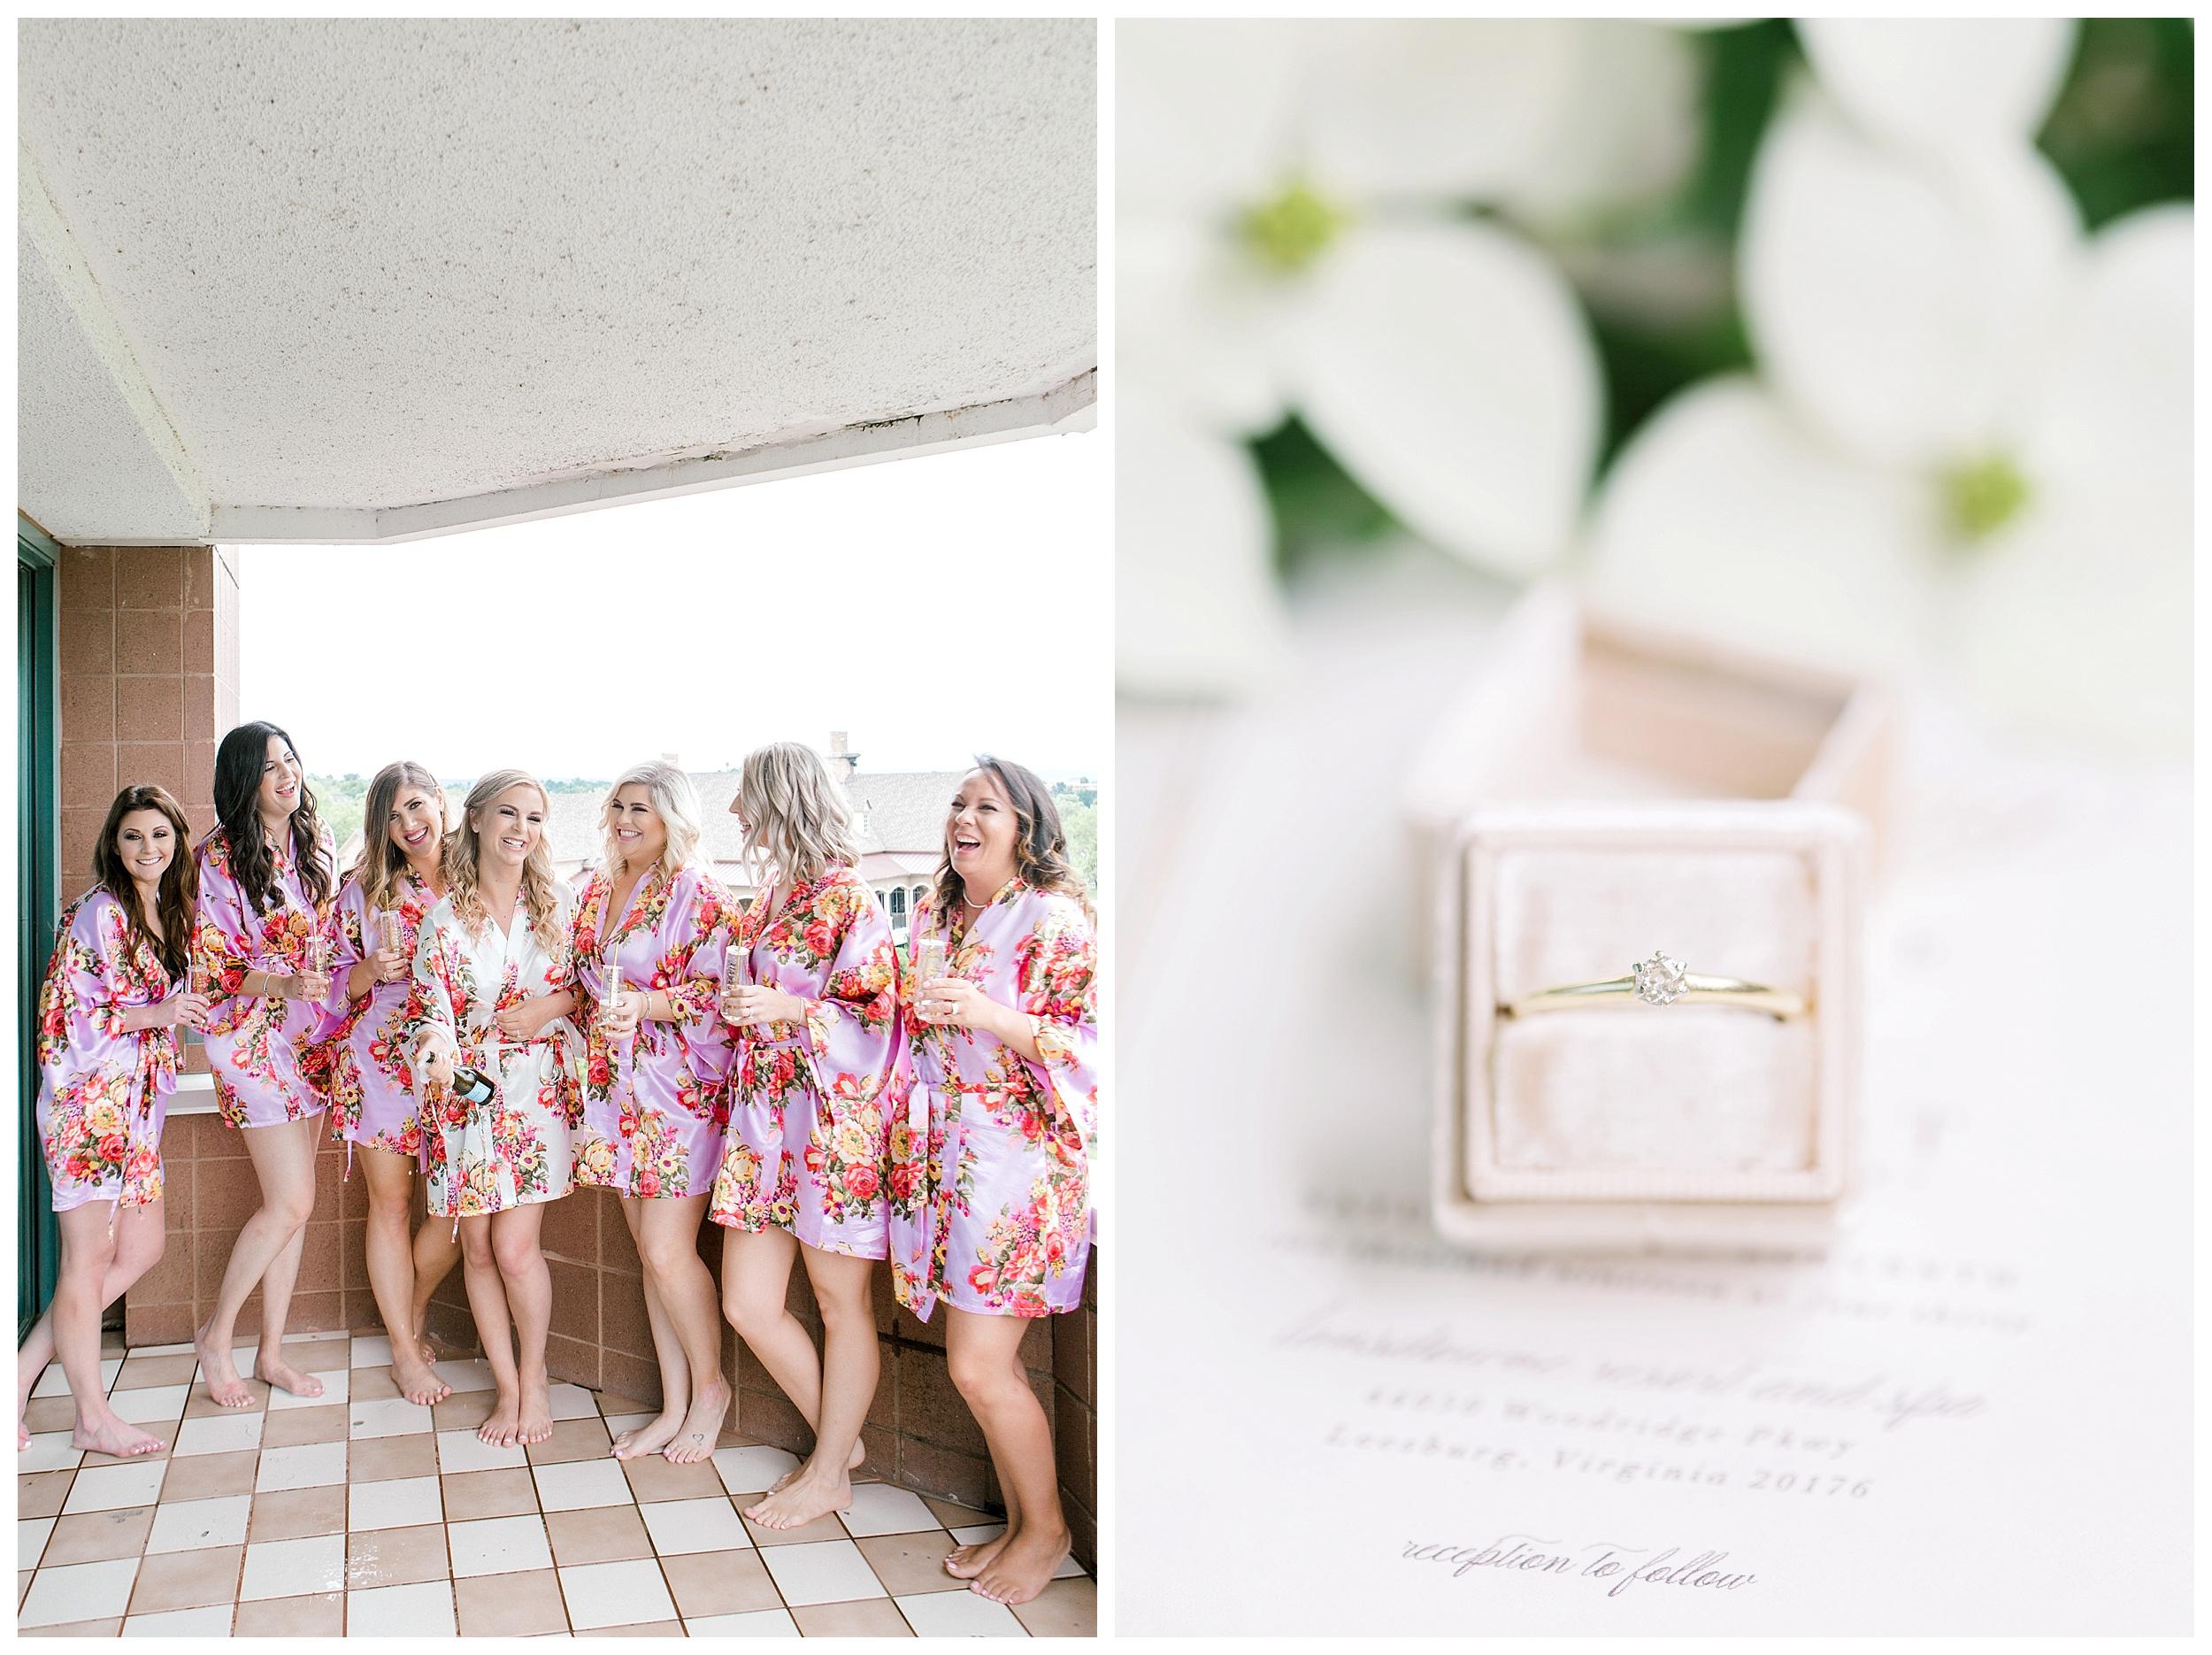 Lansdowne Resort Wedding | Virginia Film Wedding Photographer Kir Tuben_0004.jpg